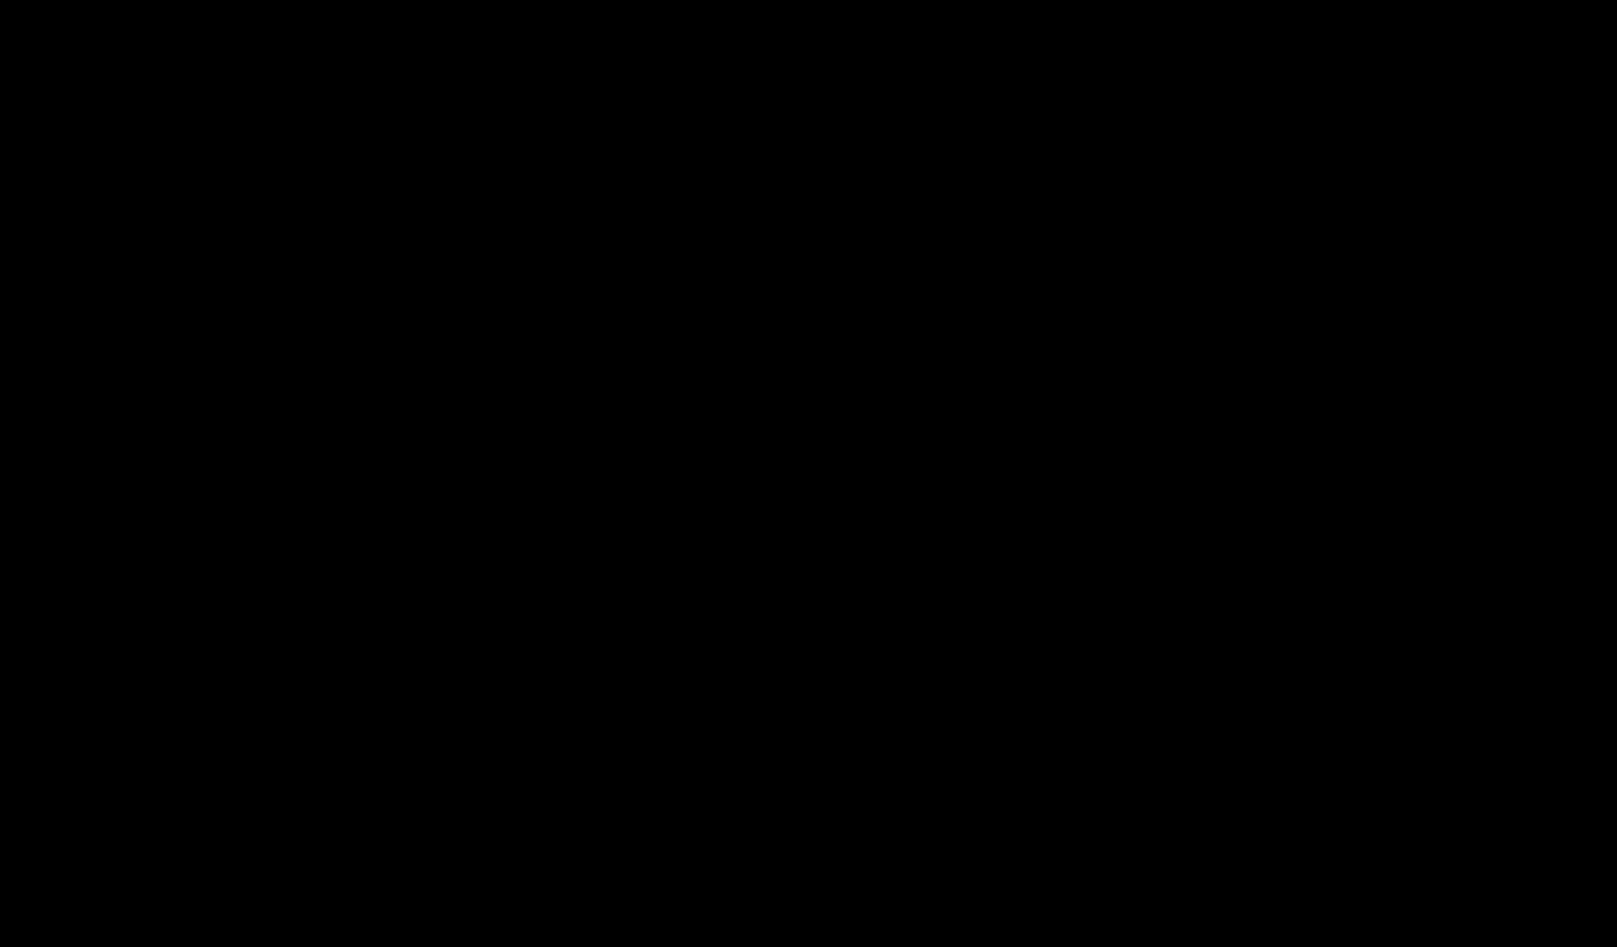 Bandeja 2121